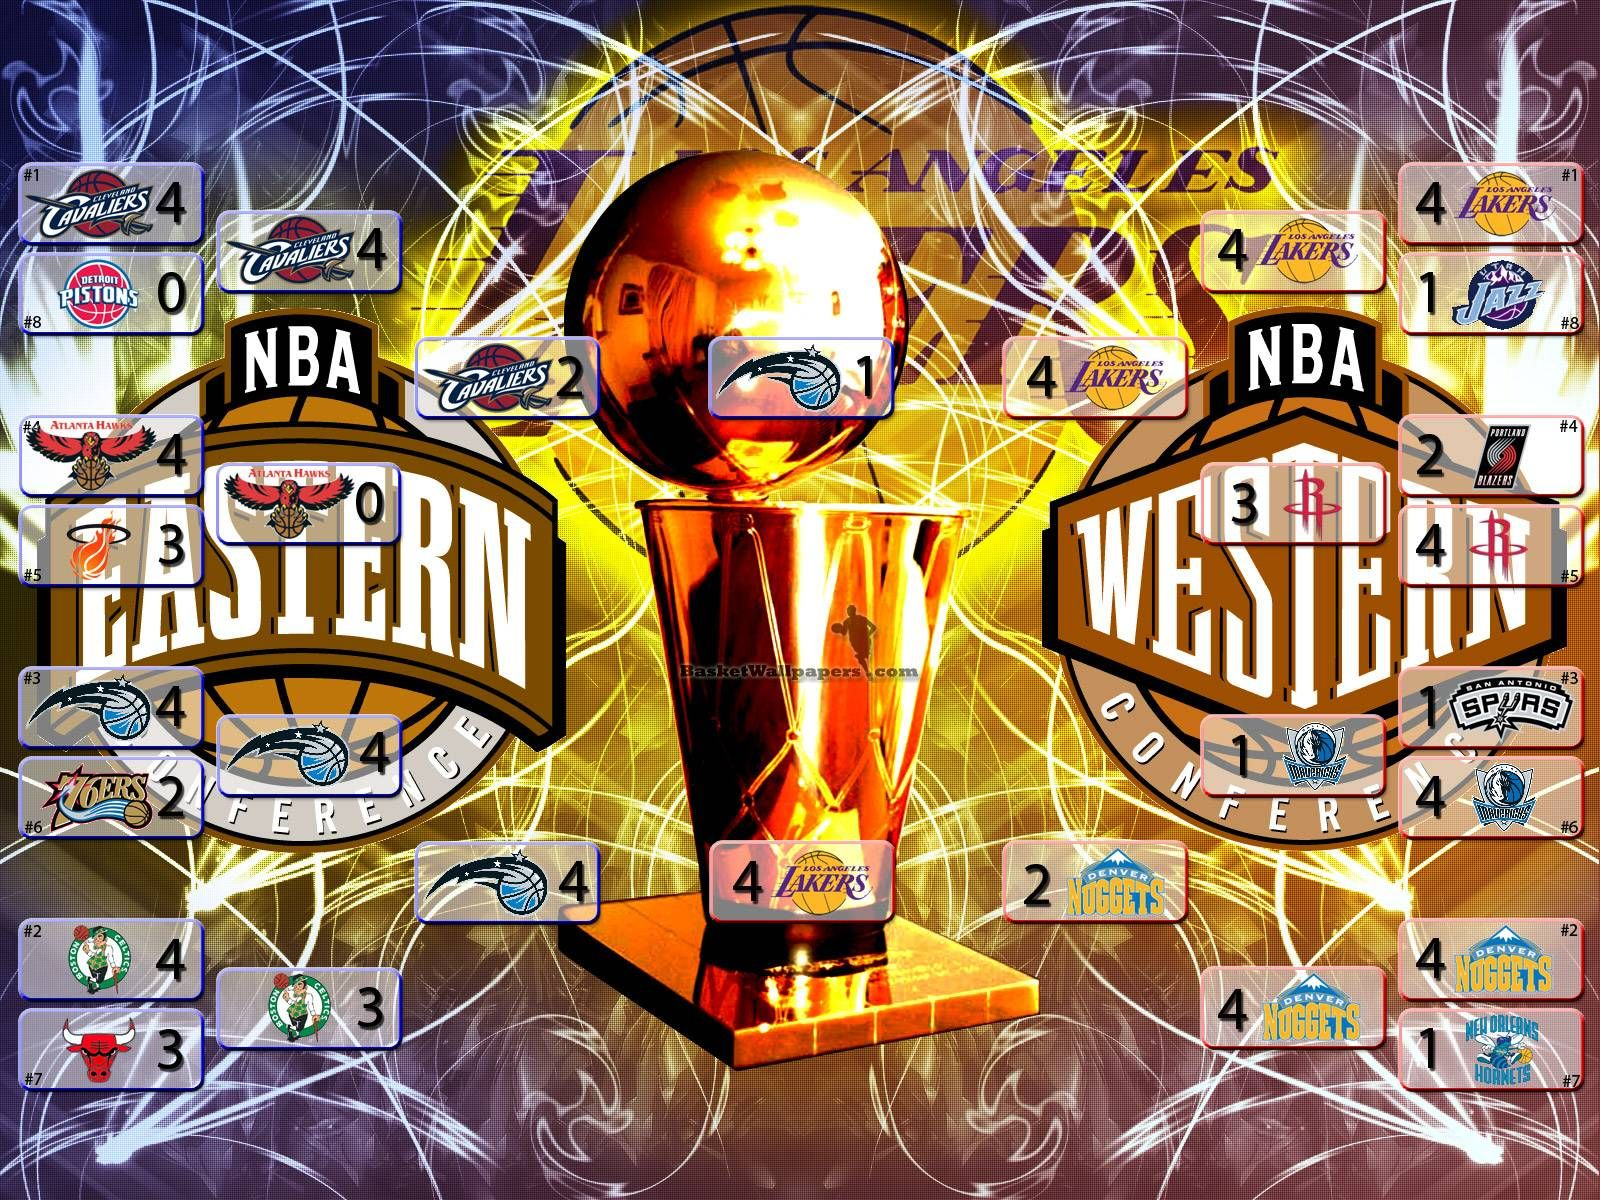 Lakers Wallpaper Schedule Live Wallpaper Hd Lakers Wallpaper Nba Playoffs La Lakers